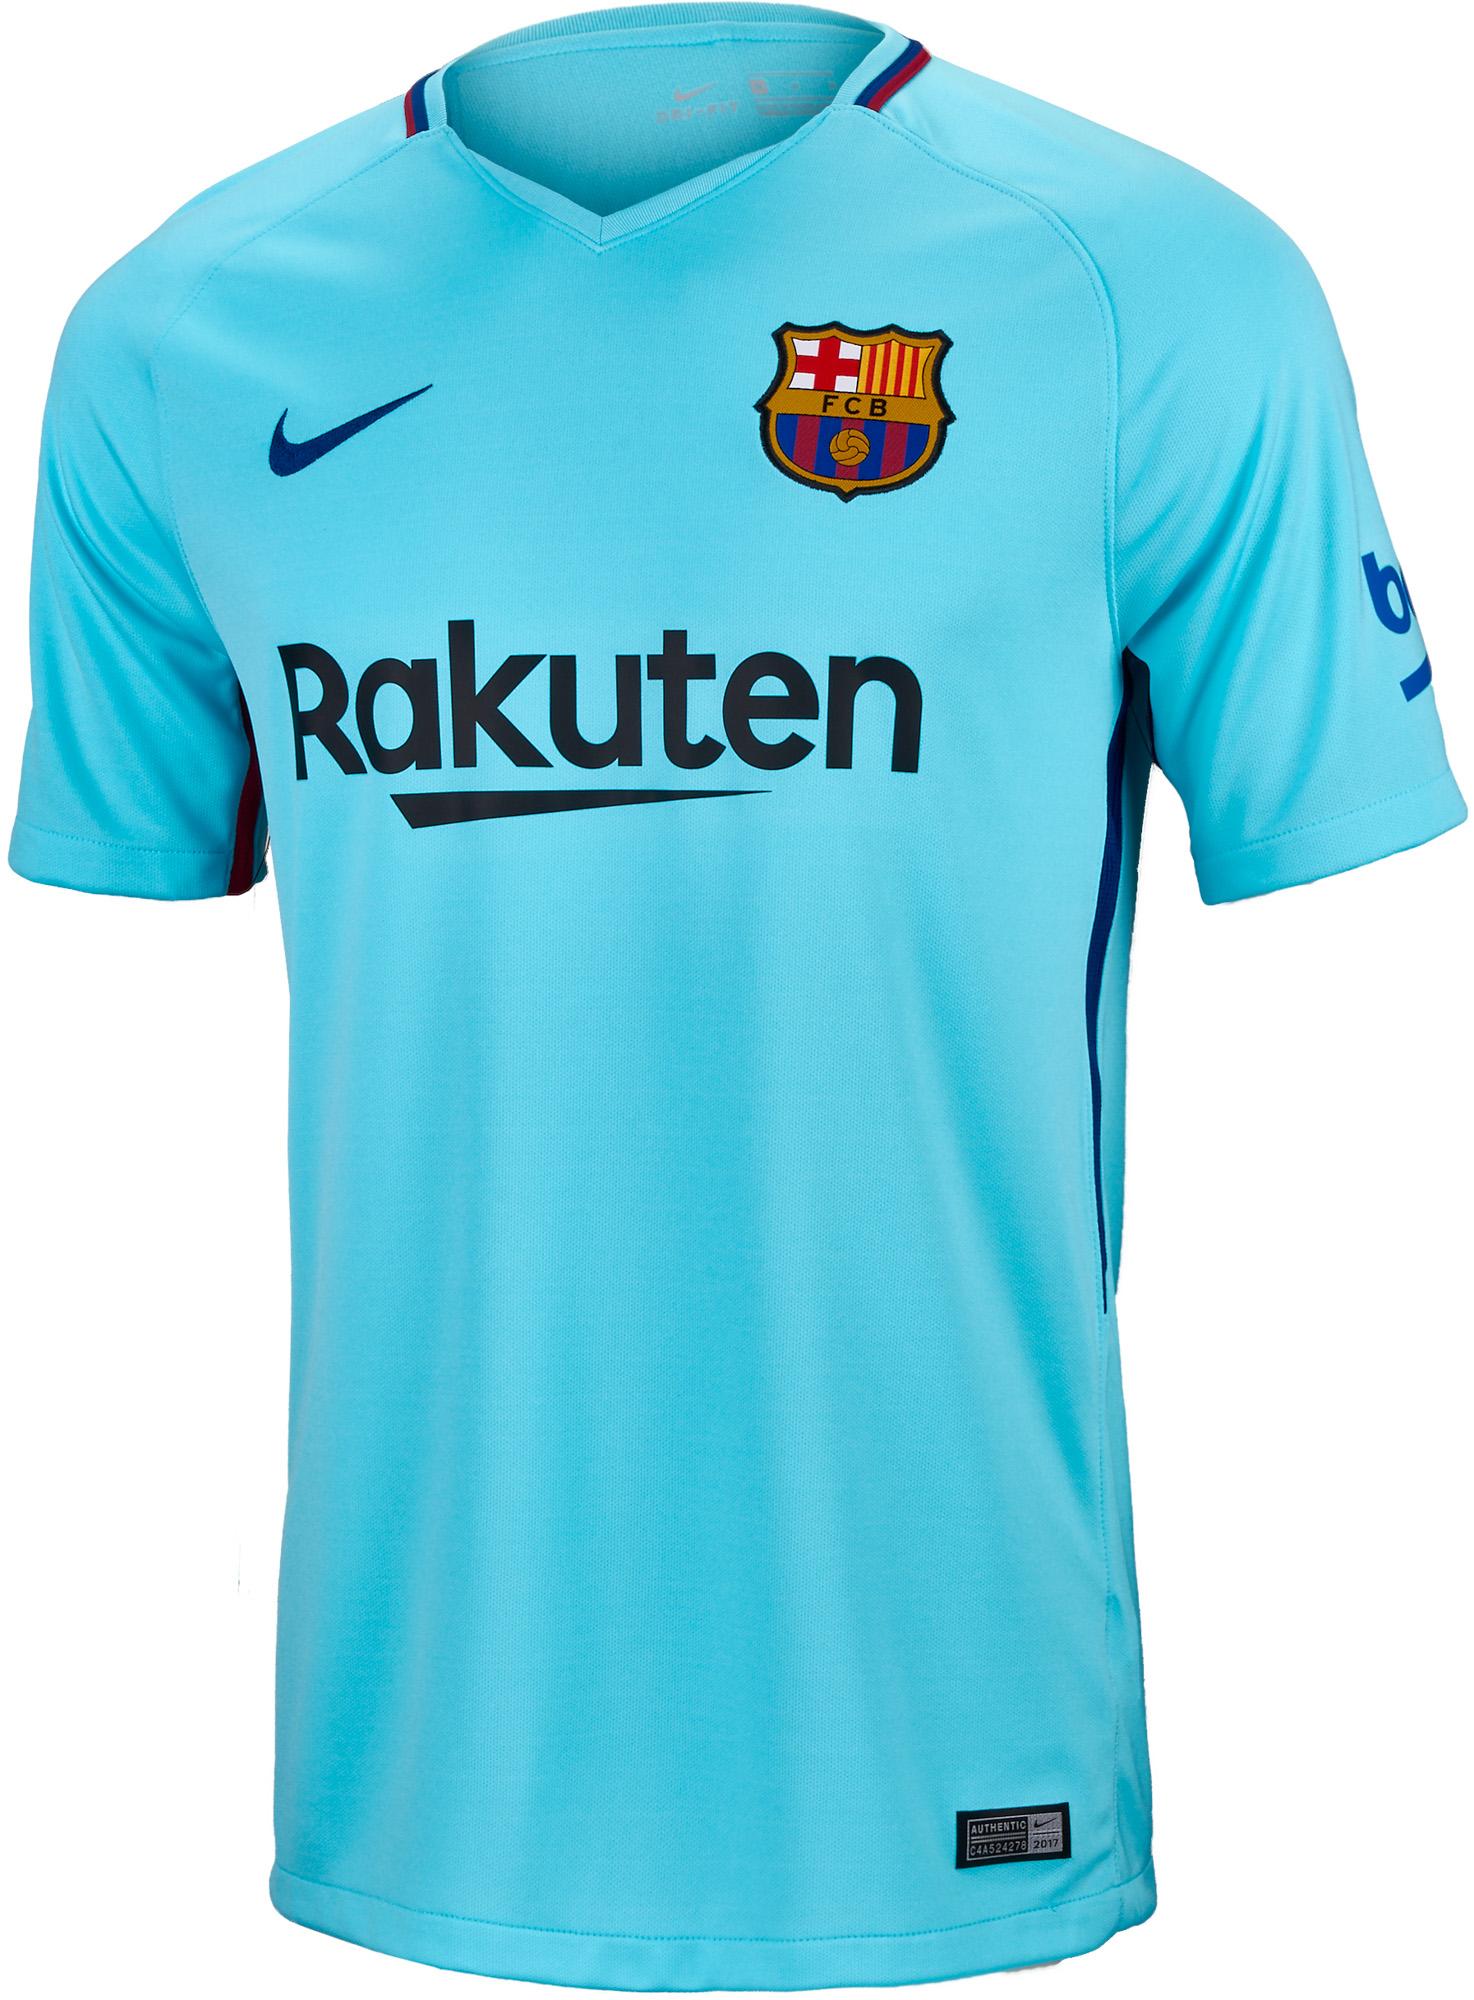 755bc7d1bbd Nike Kids Barcelona Away Jersey- 17/18 Barcelona Jersey